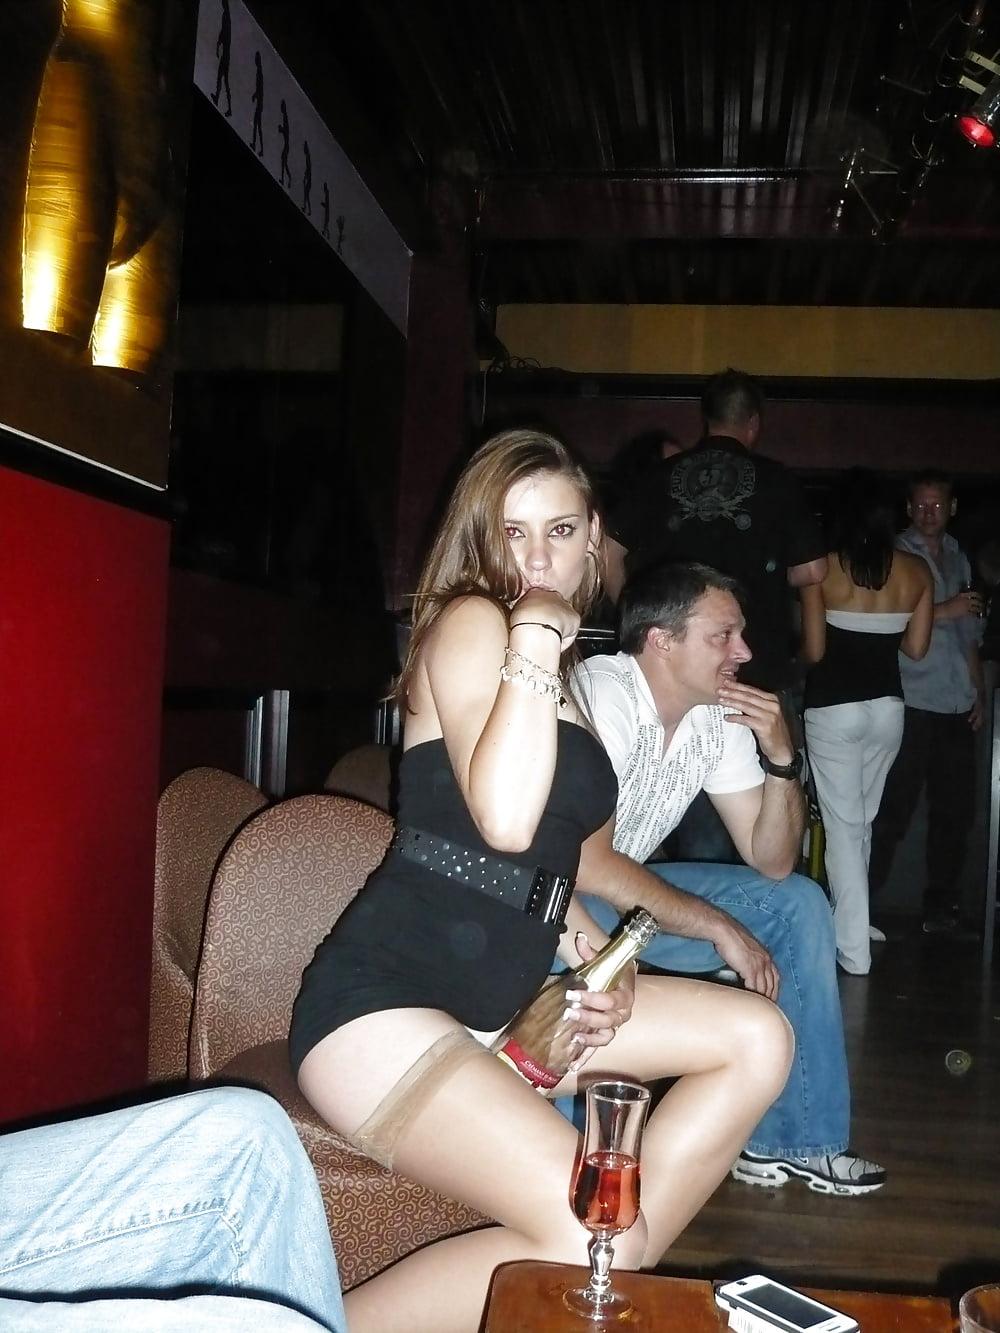 Club girls upskirt video